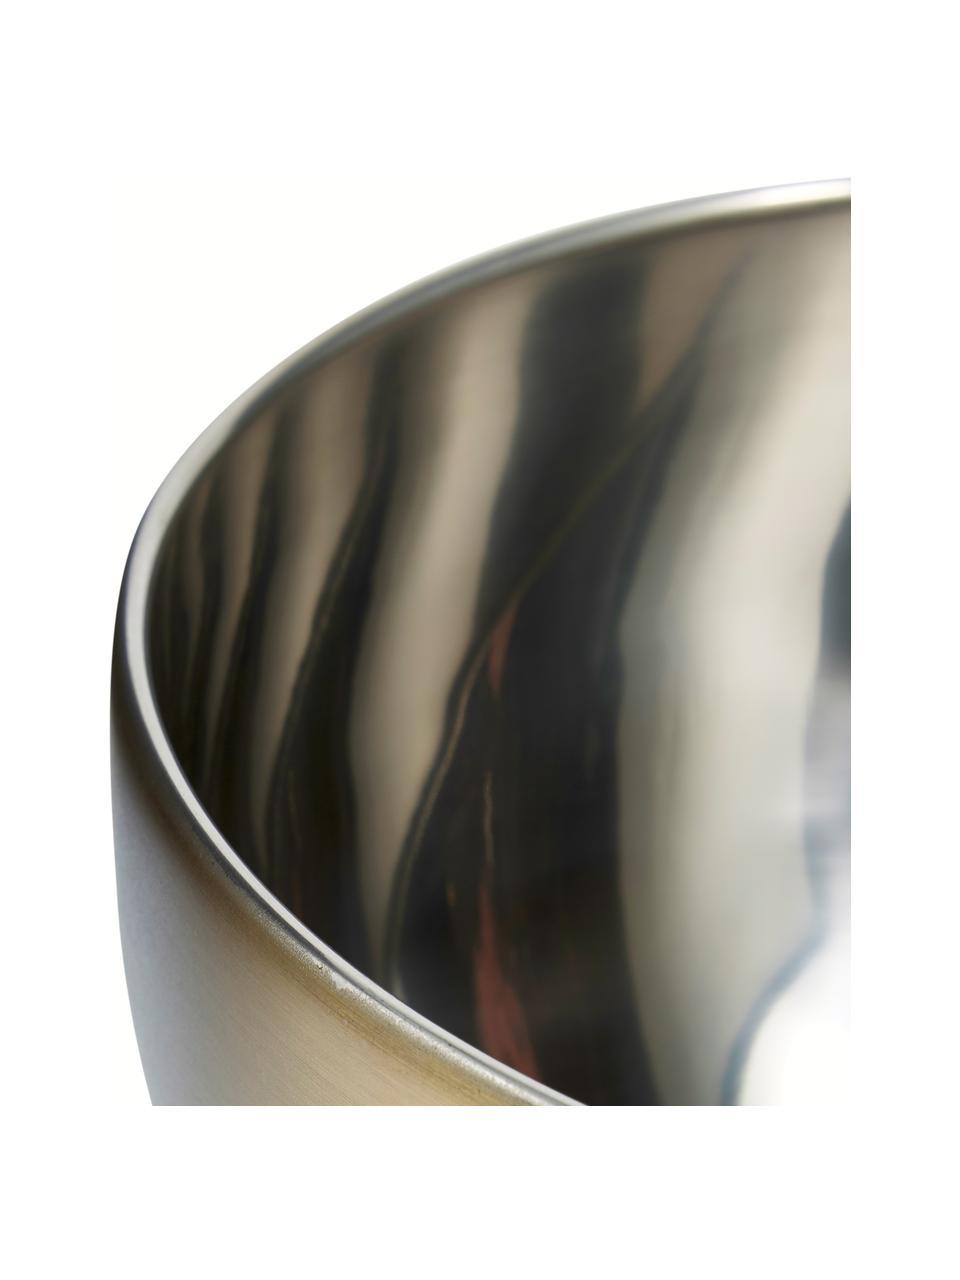 Schüssel Master Class aus Edelstahl, verschiedene Größen, Außen: Edelstahl, beschichtet, Innen: Edelstahl, Messingfarben, Edelstah, Ø 21 x H 12 cm